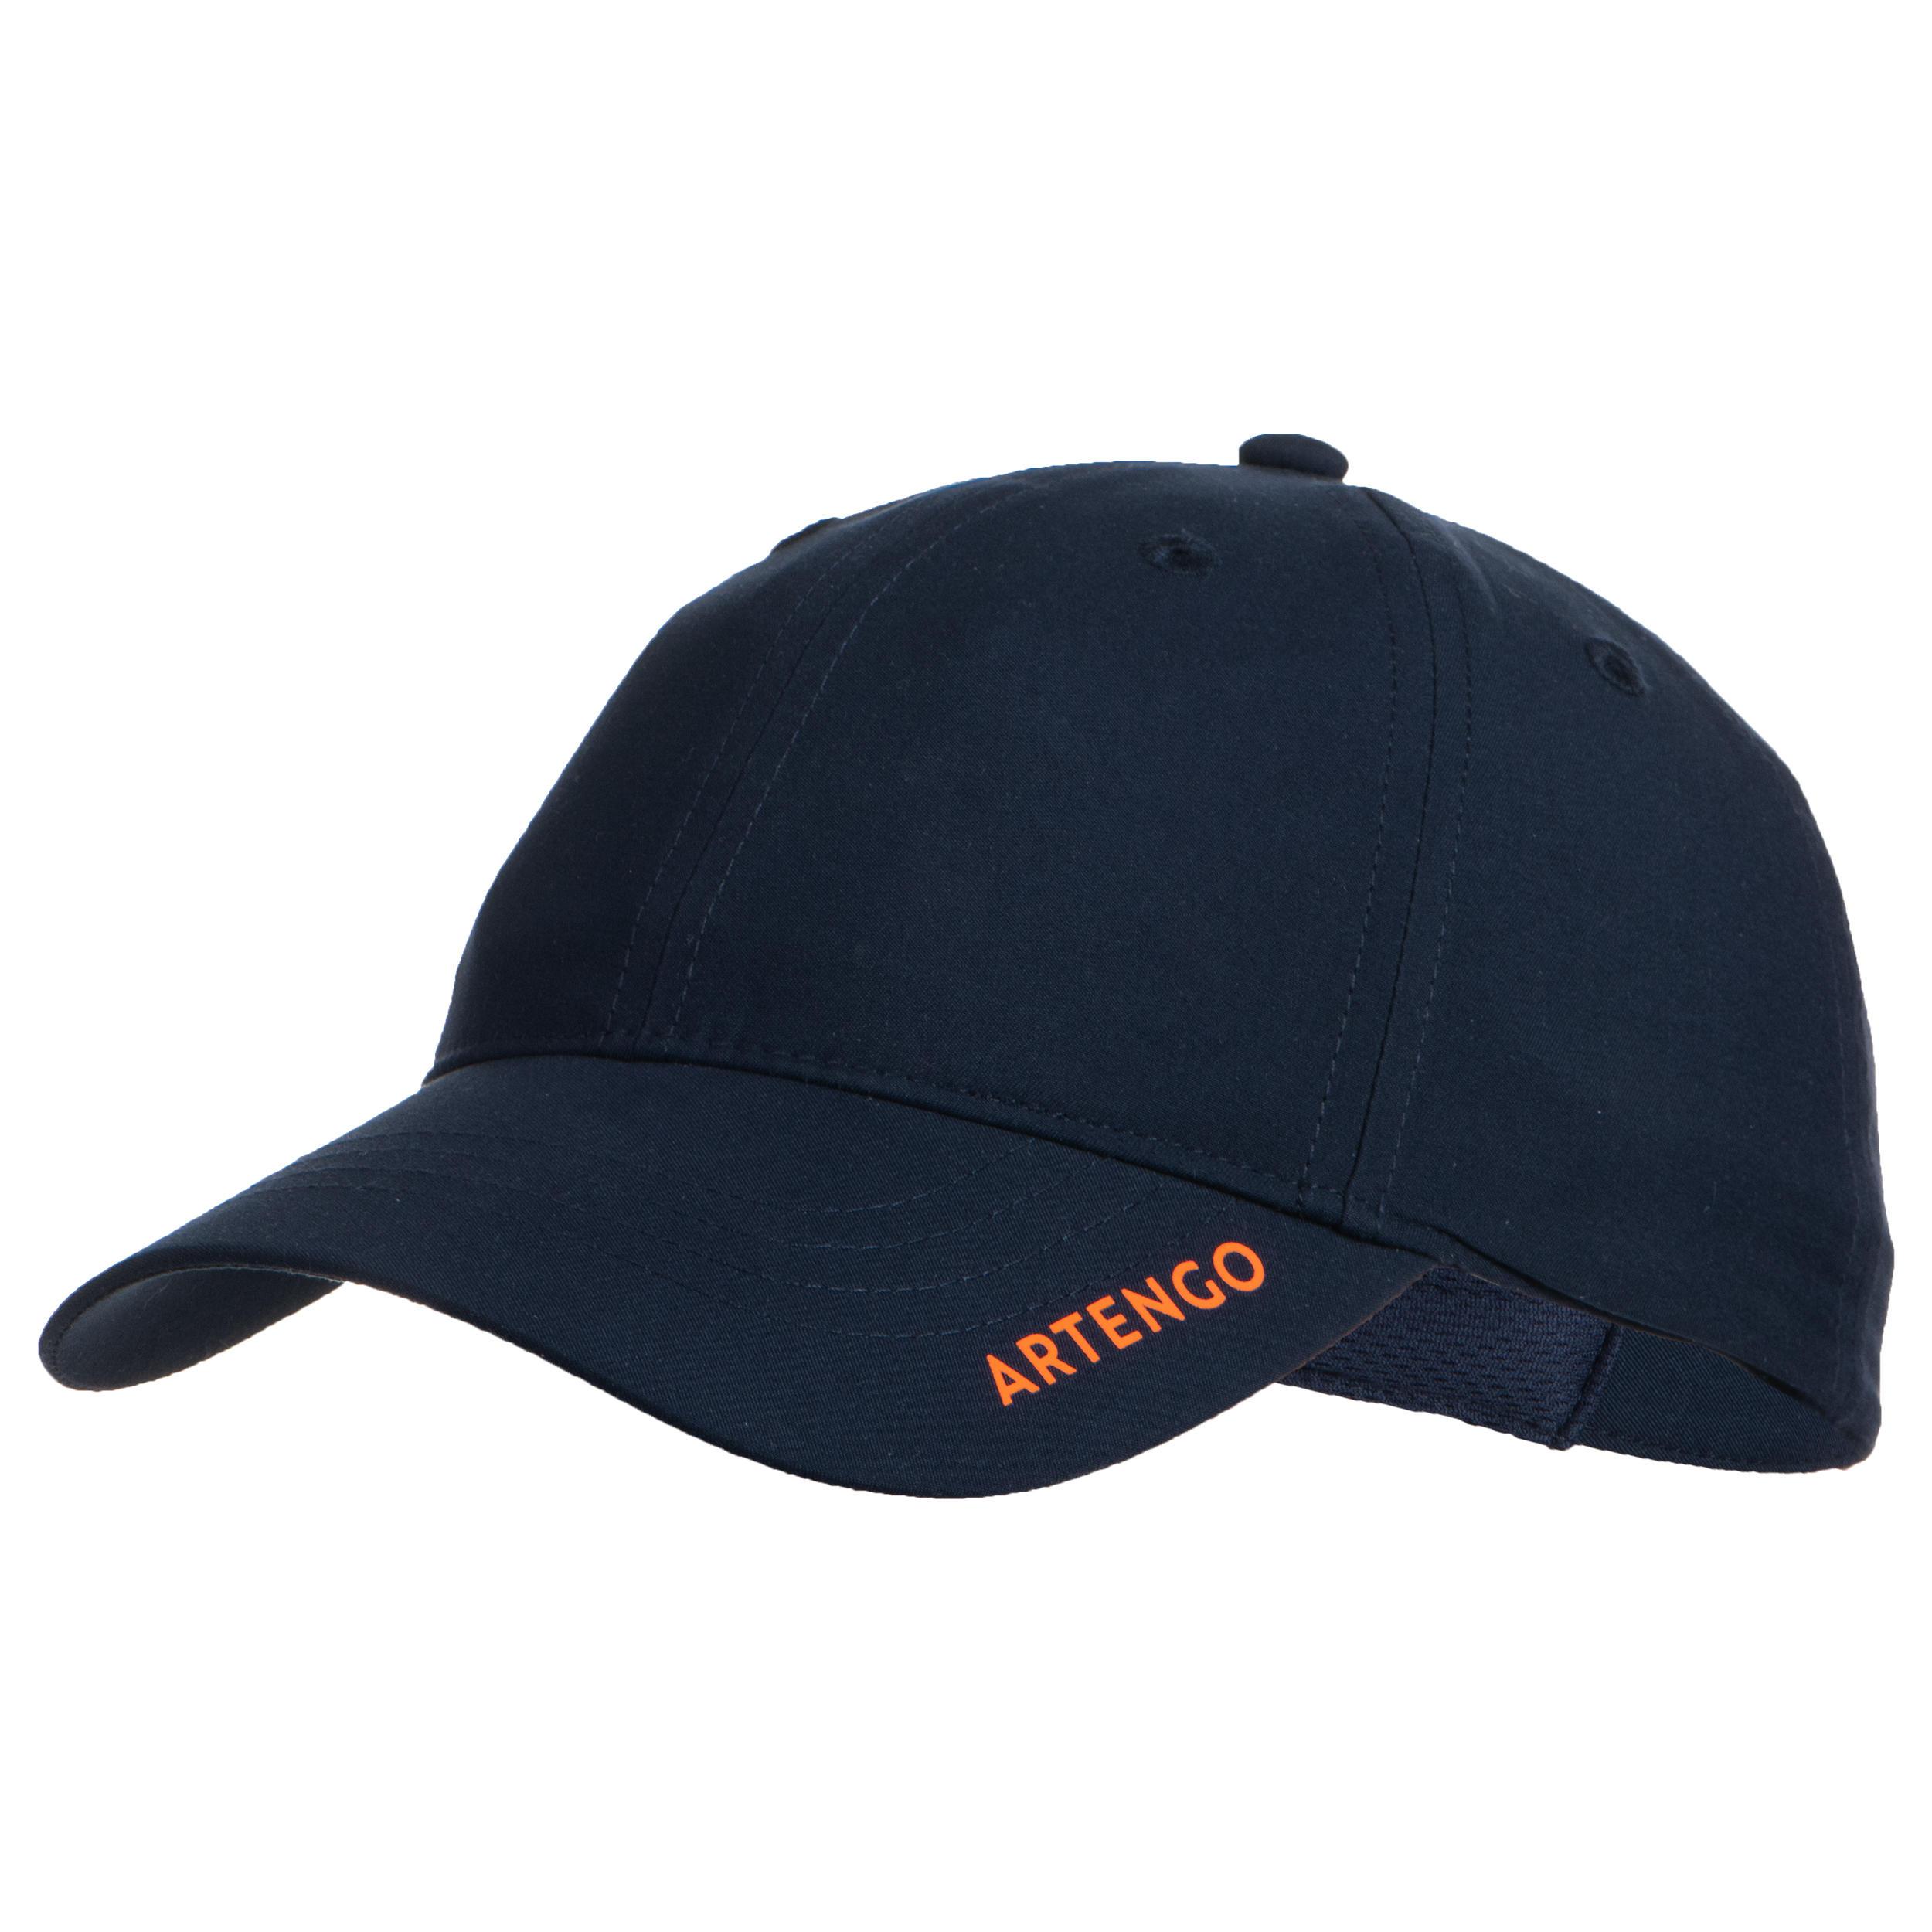 Schirmmütze Tennis-Cap TC 500 Gr.54 marineblau